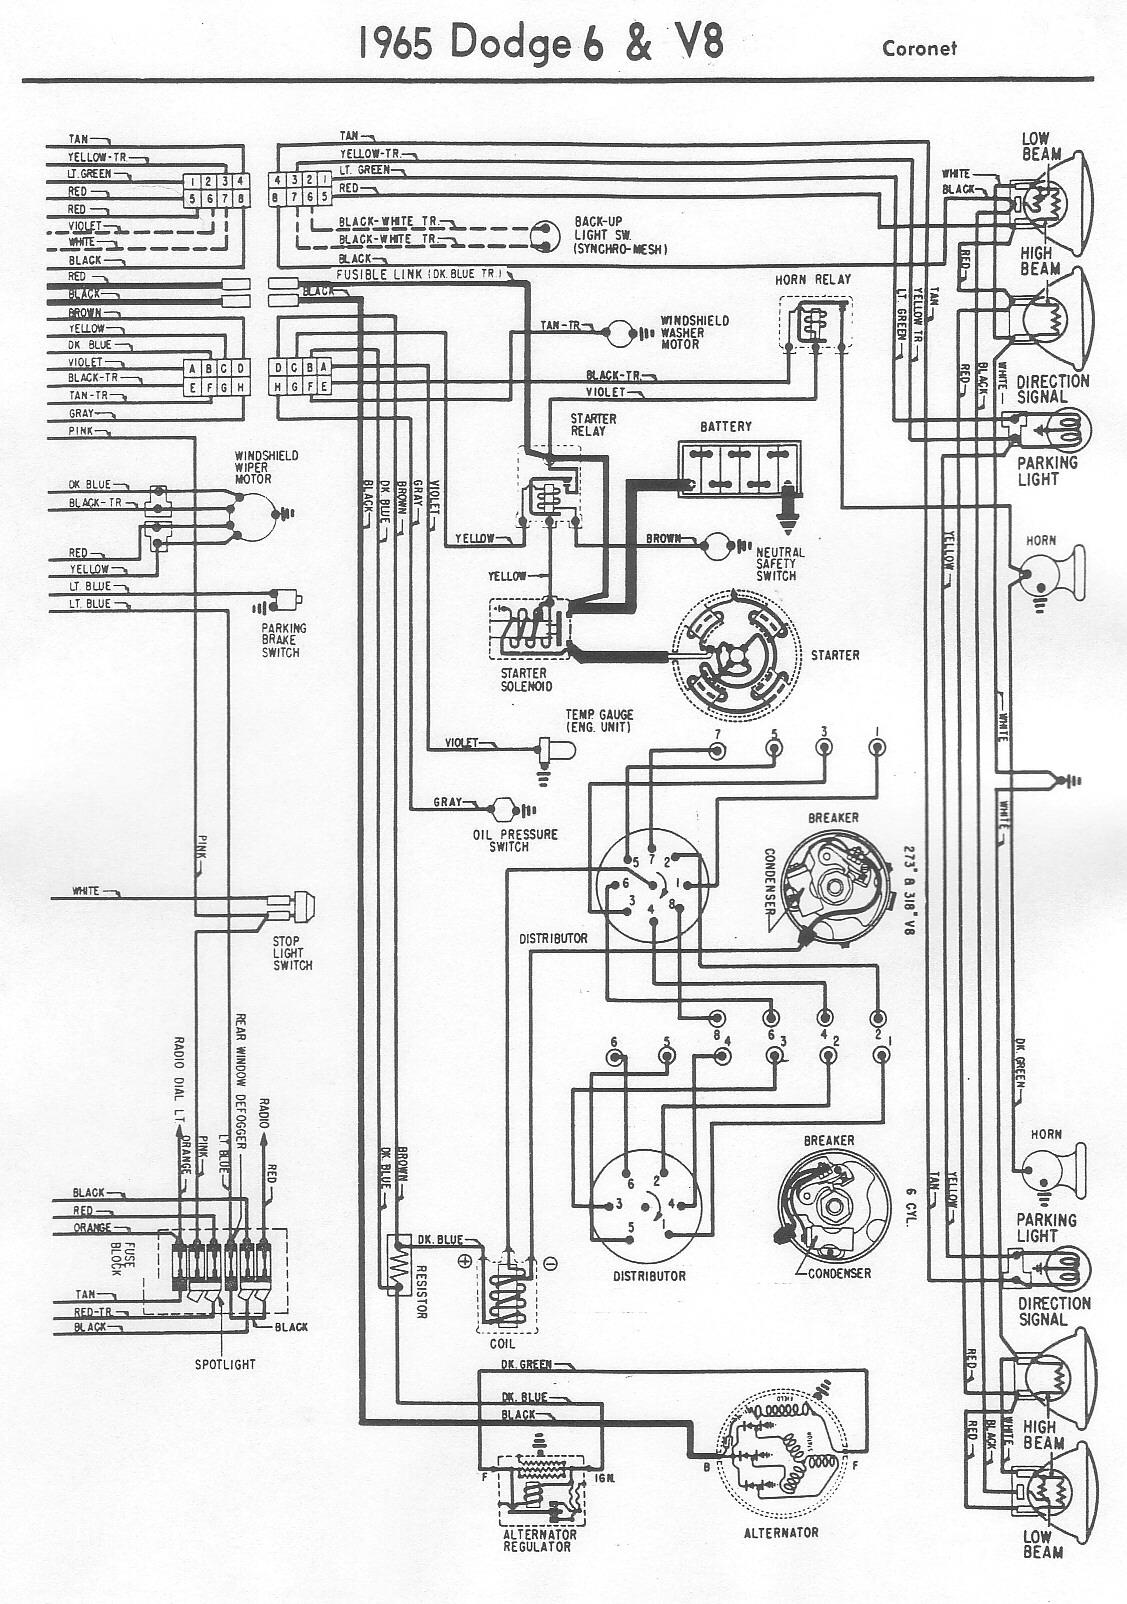 medium resolution of wiring diagram for 1966 dodge coronet wiring diagram todays dodge wiring diagram wires 1964 dodge coronet